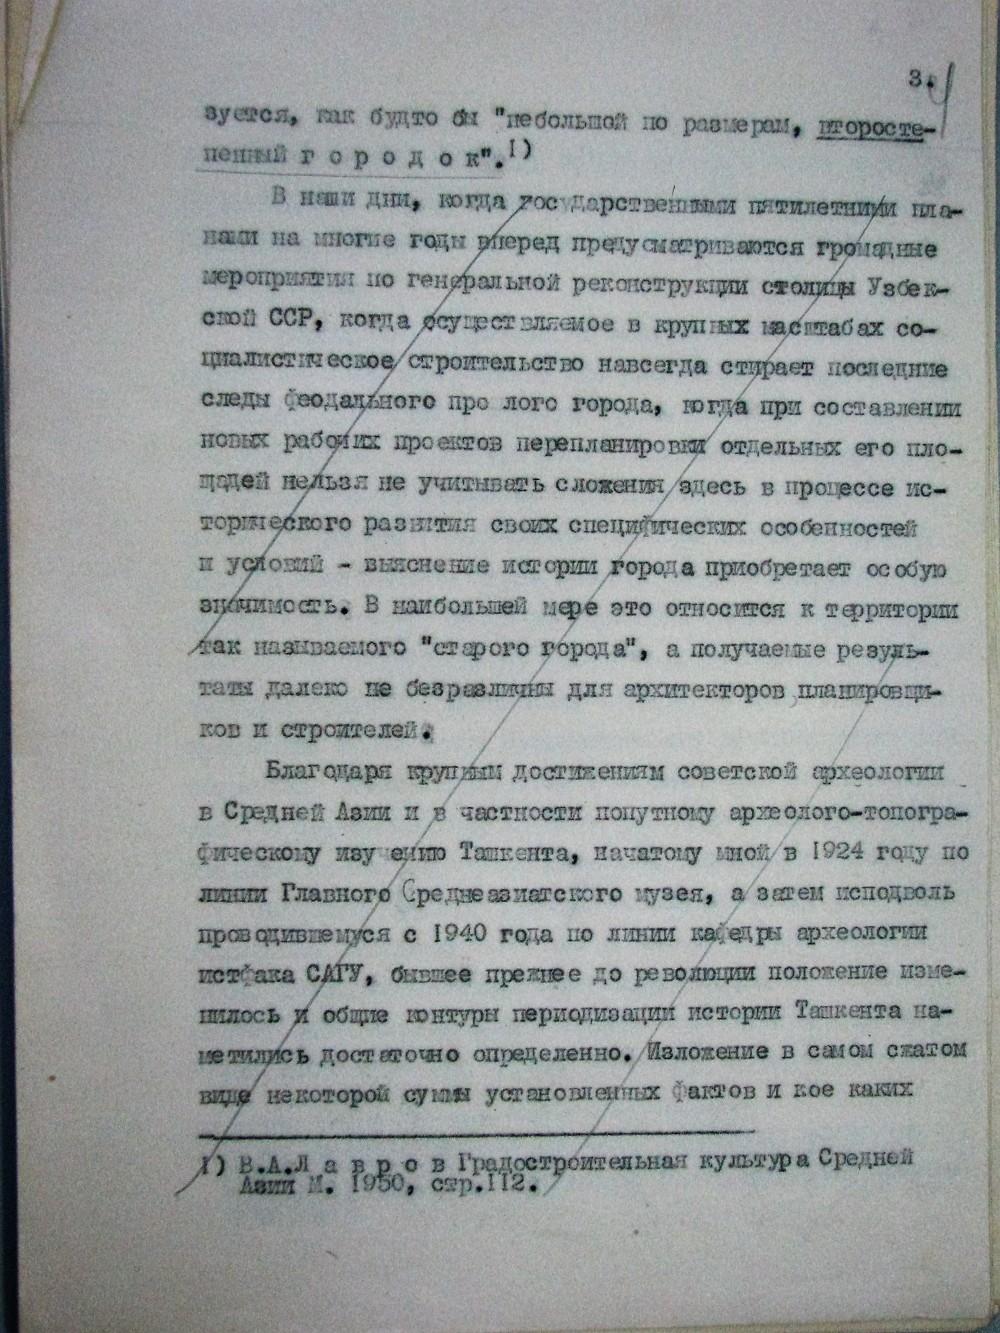 Ташкент, Массон (3)